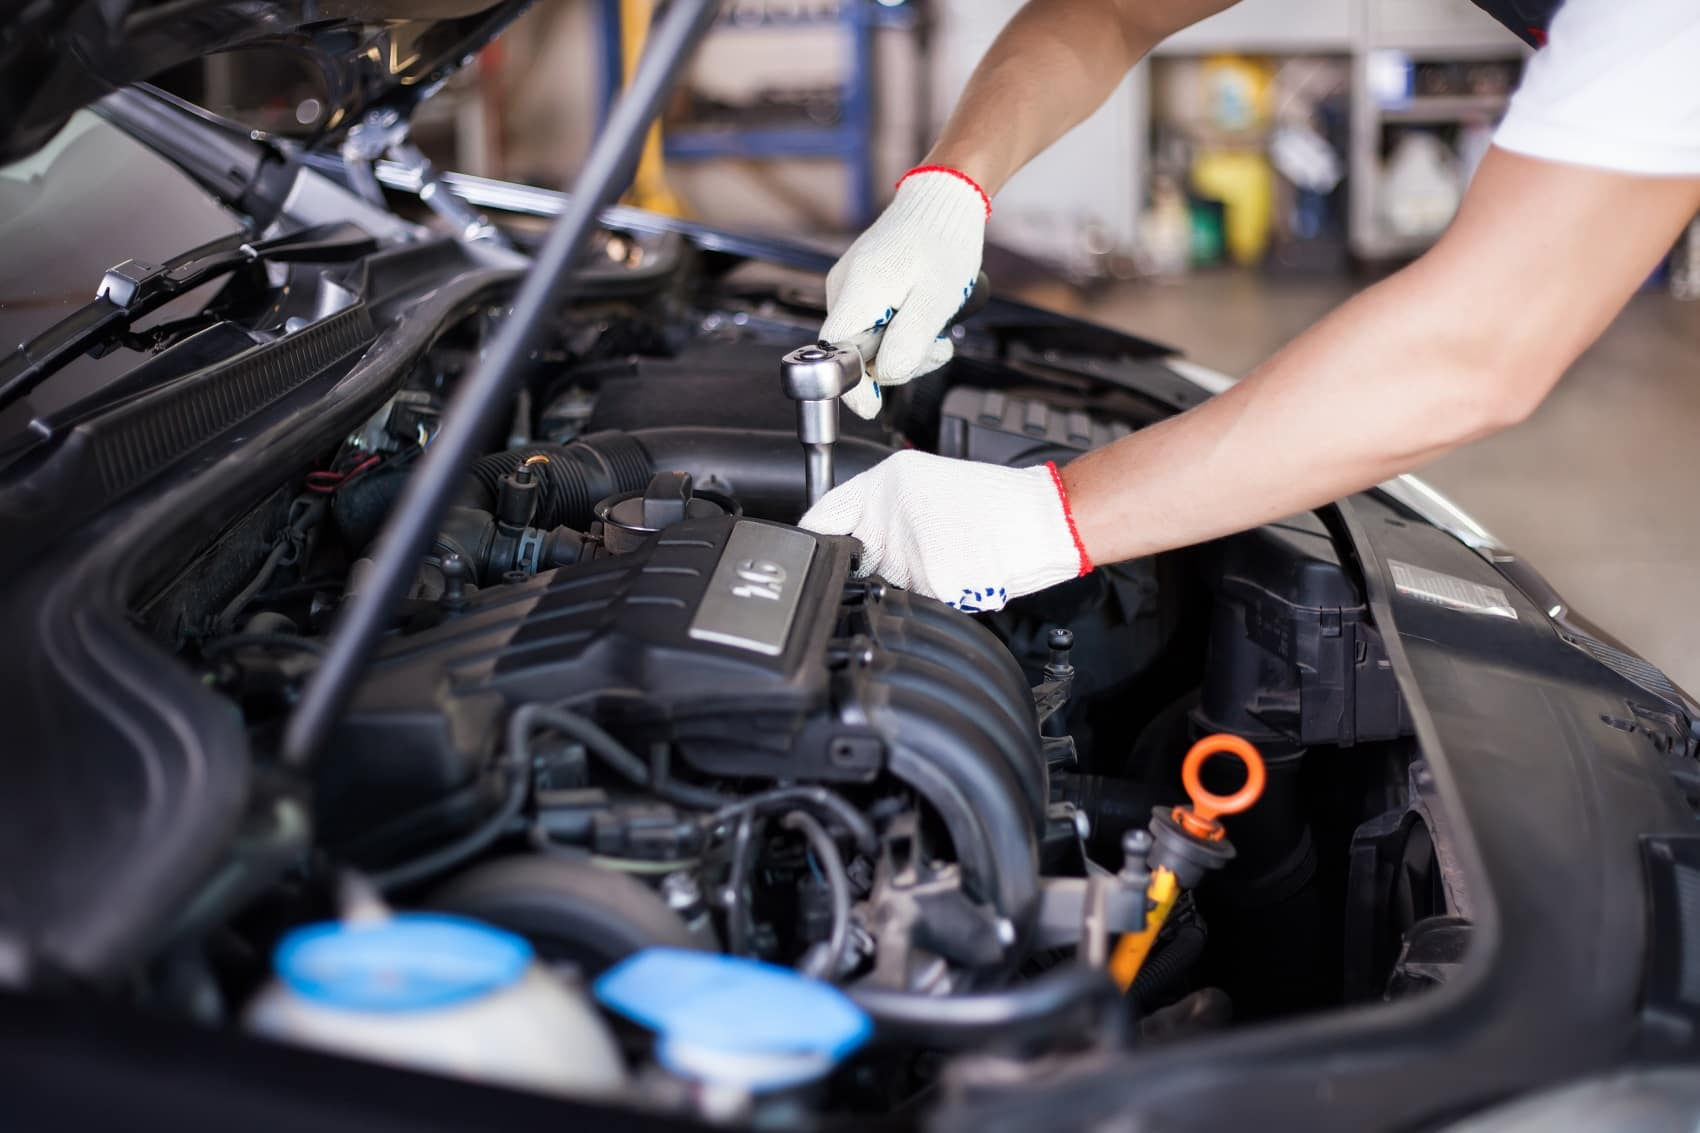 Ram Service and Maintenance